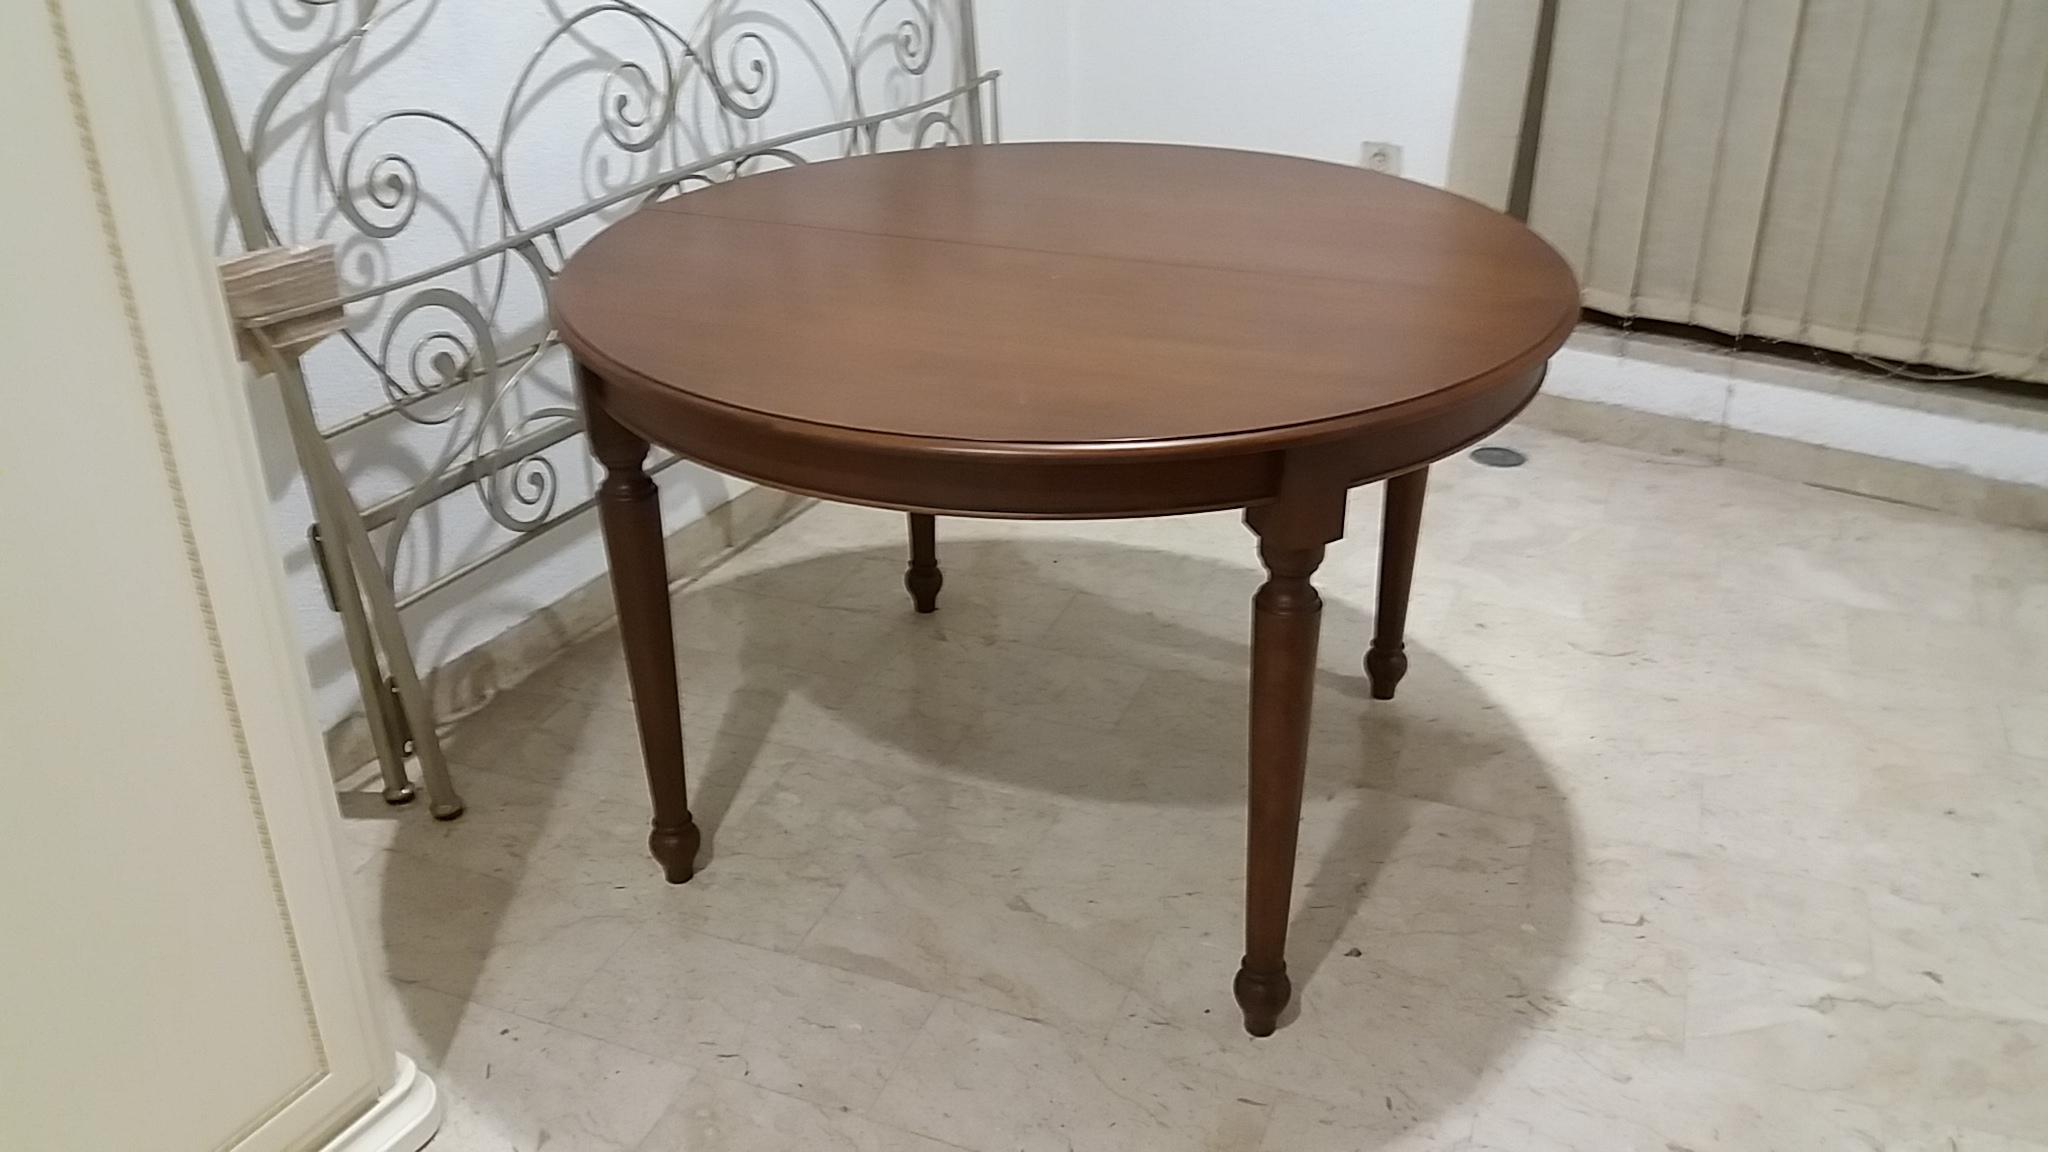 Tavoli bianchi allungabili tavoli with tavoli bianchi for Tavoli rotondi allungabili bianchi